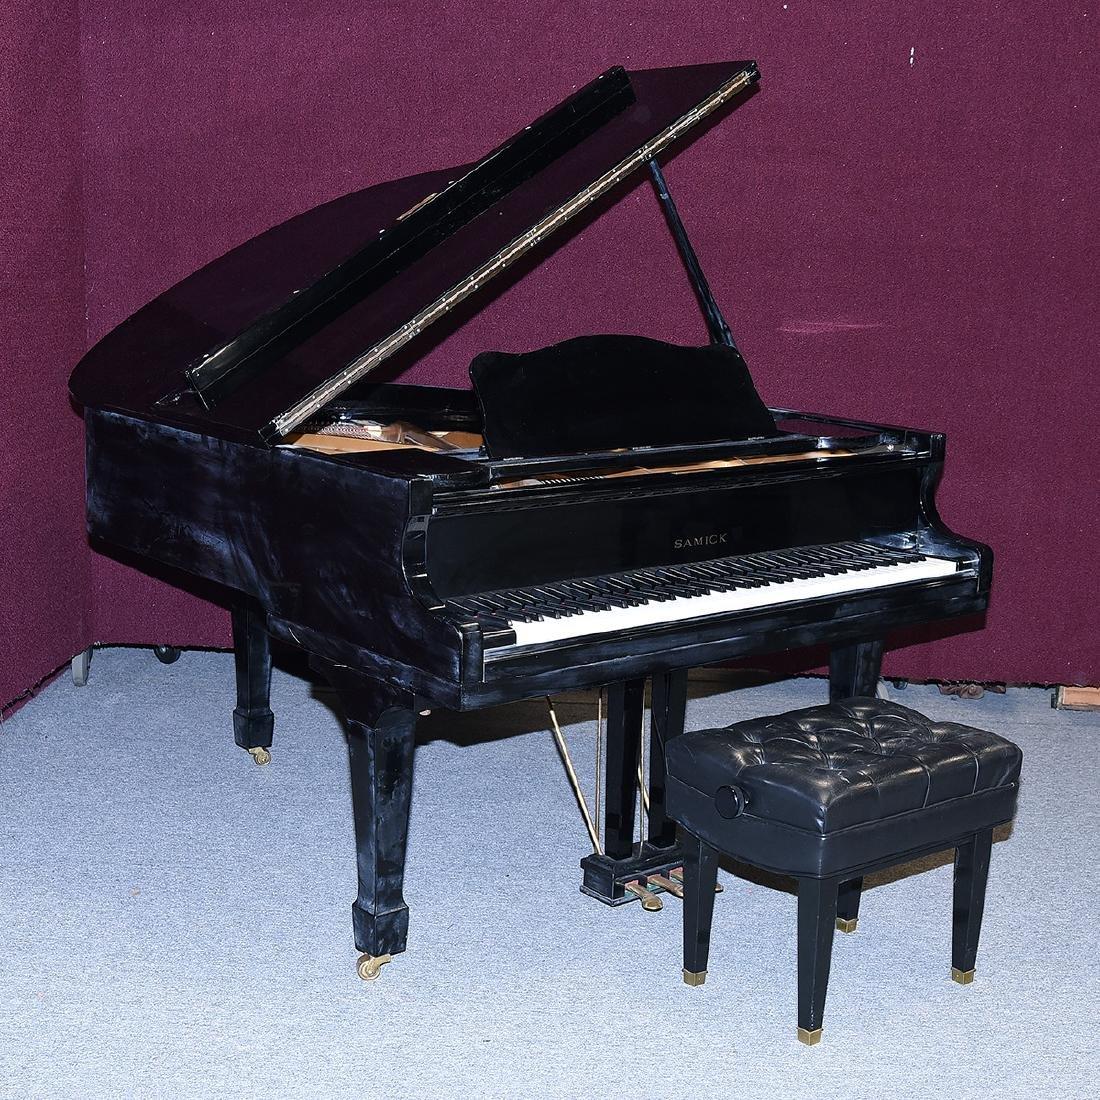 Samick Ebonized Grand Piano and Bench